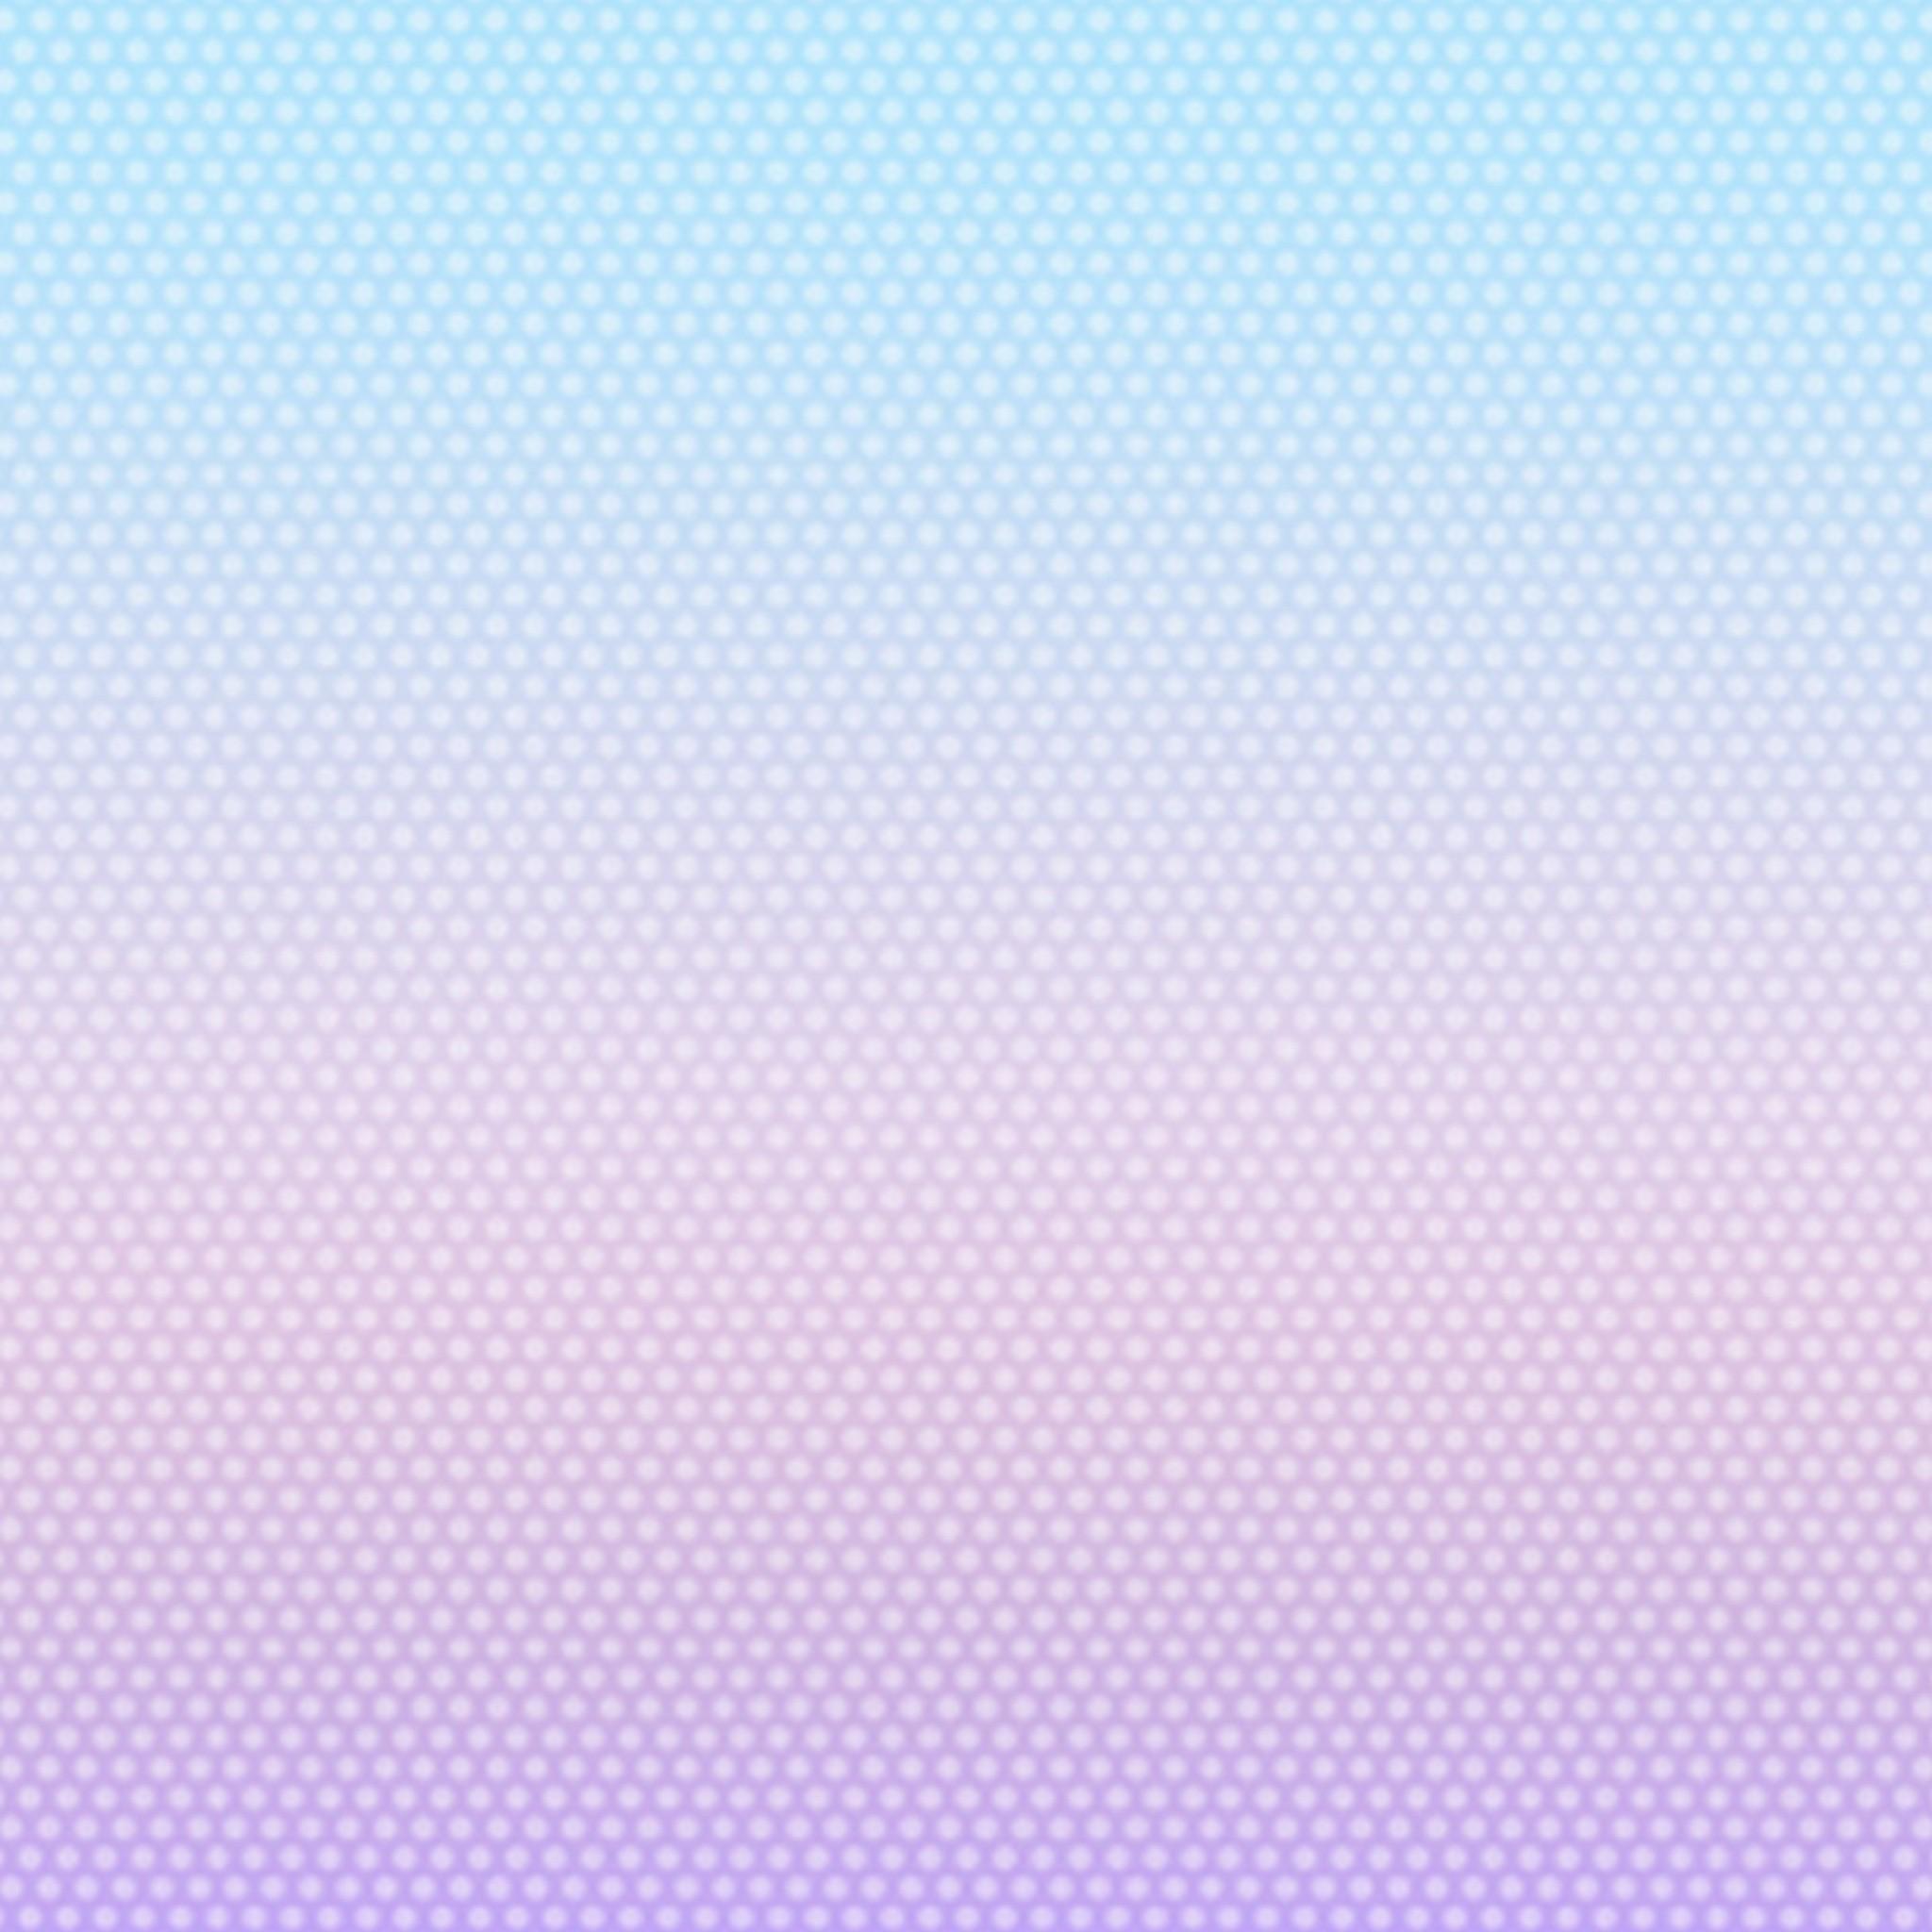 Wallpaper IOS 7 Ios 7 Wallpaper Cydia IOS 7 Wallpaper IPhone 4 2048x2048